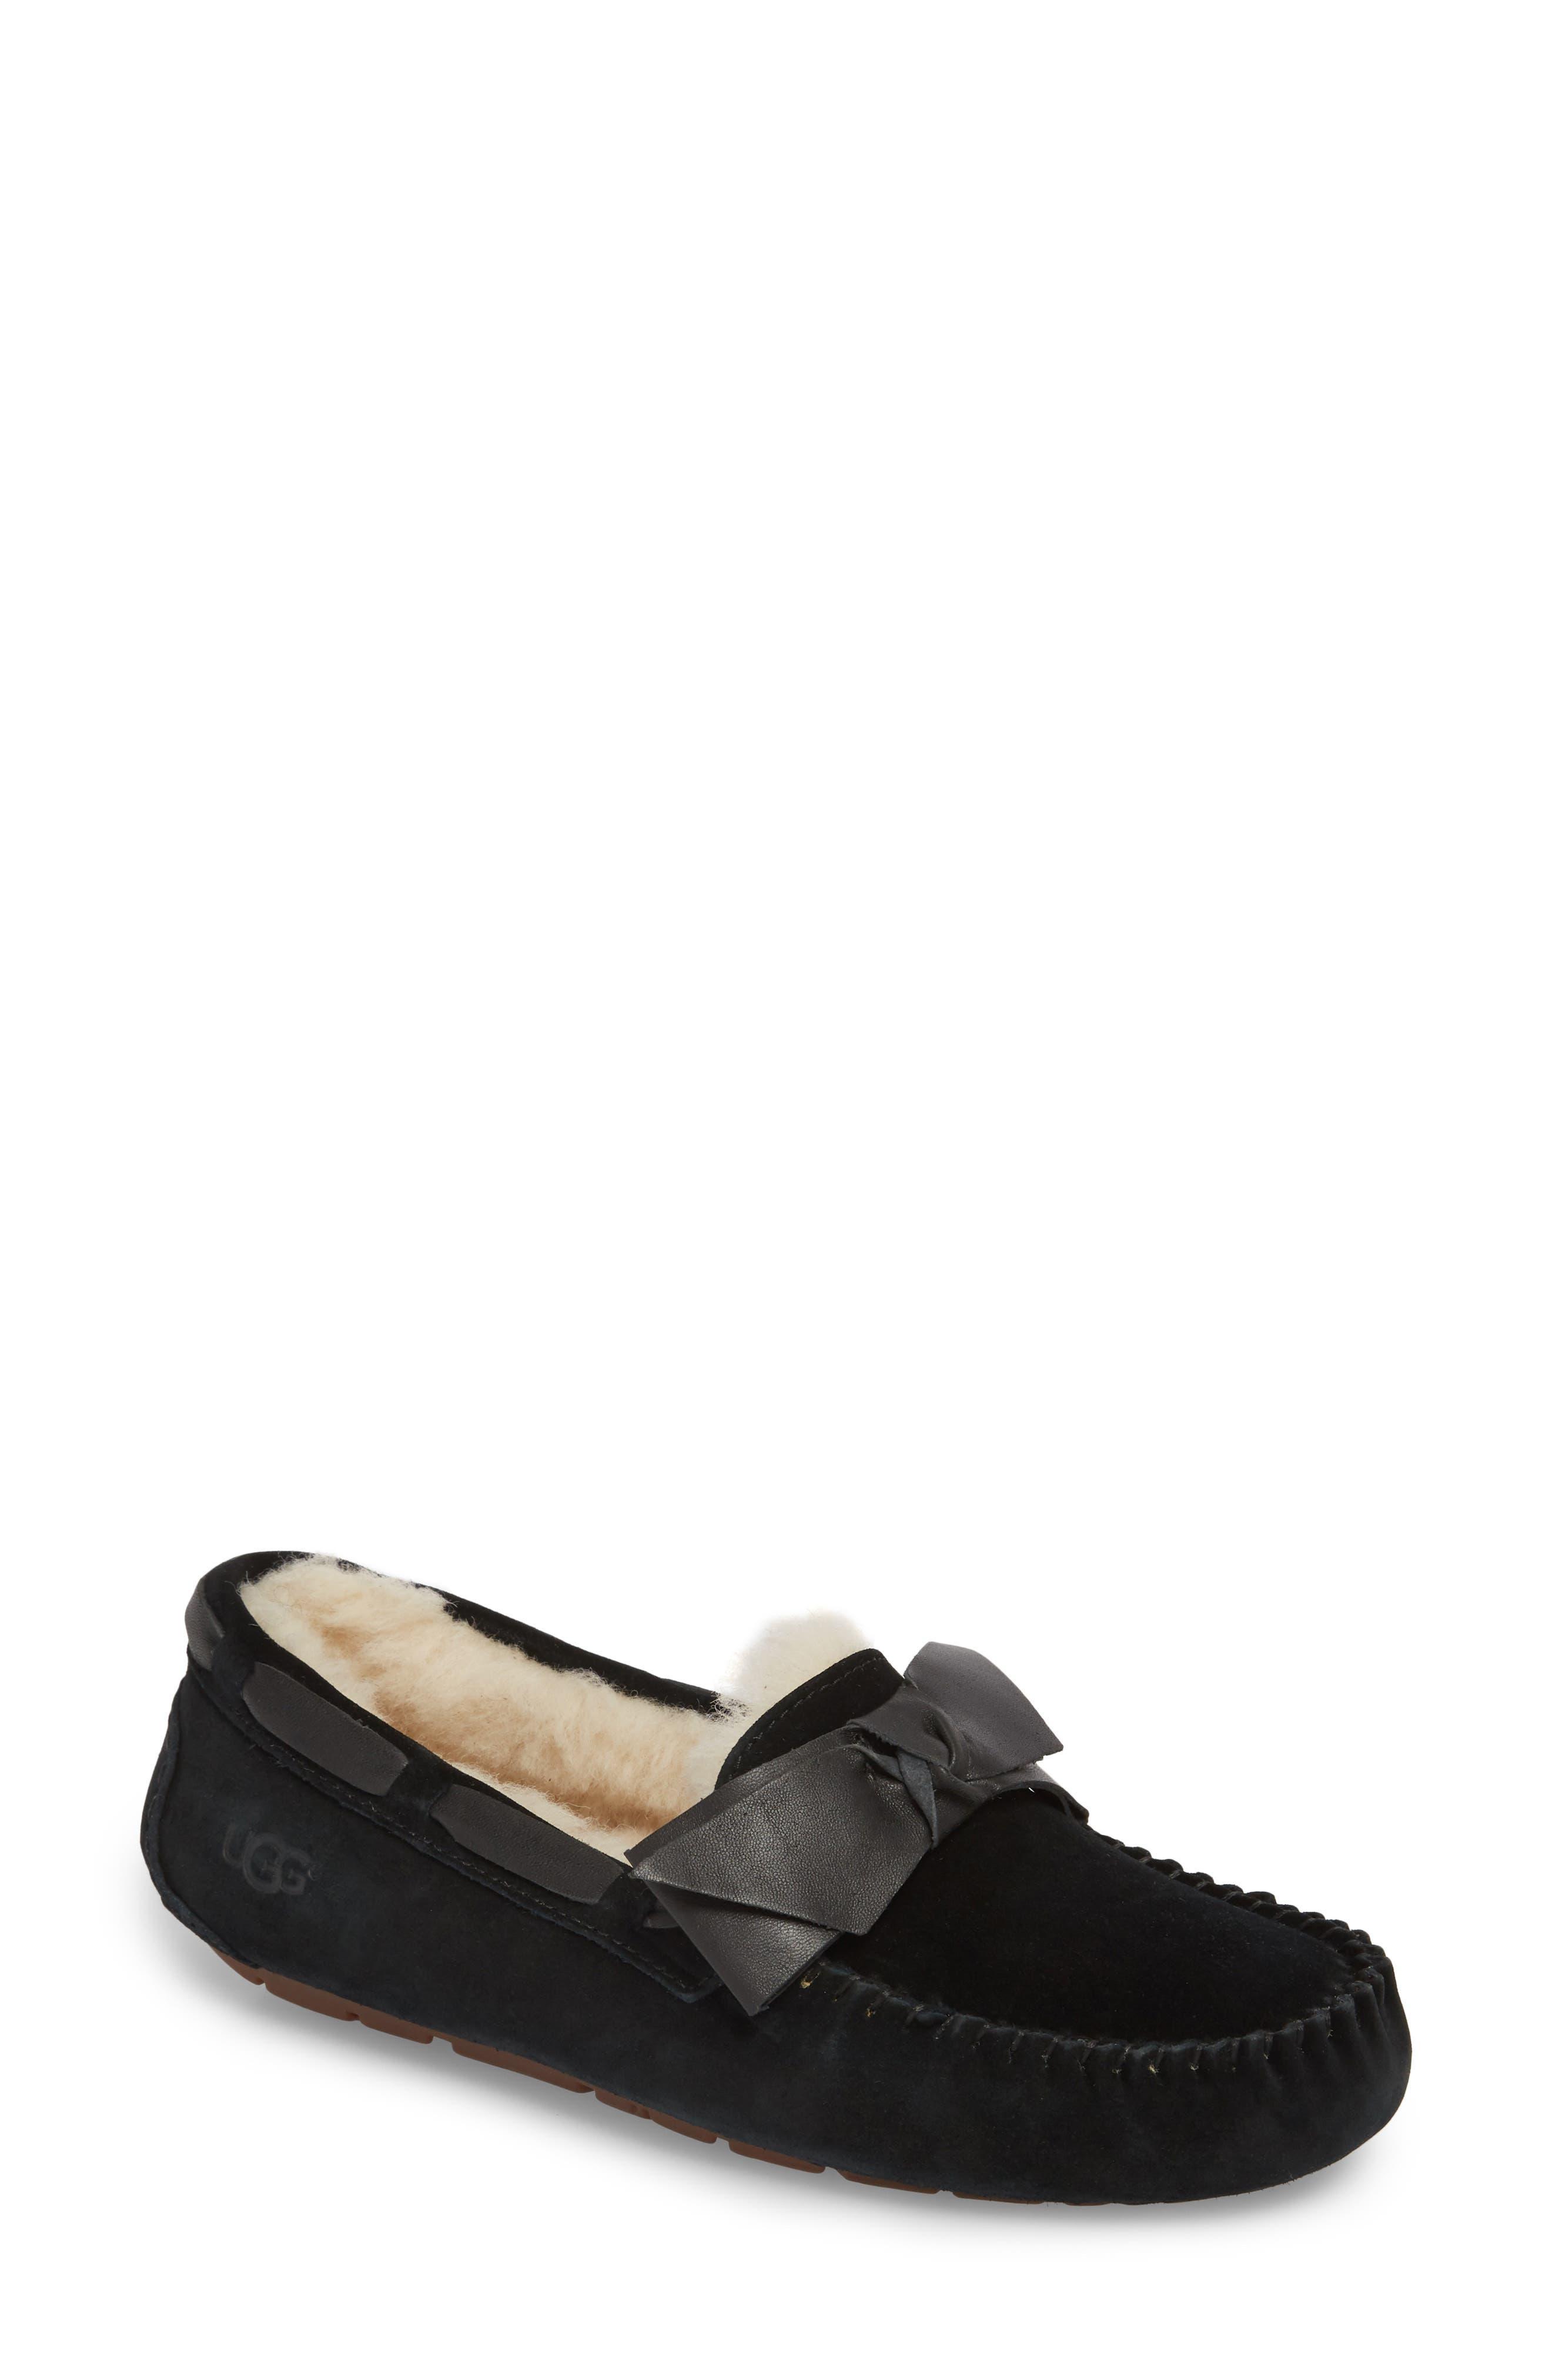 Ugg Dakota Bow Slipper, Black